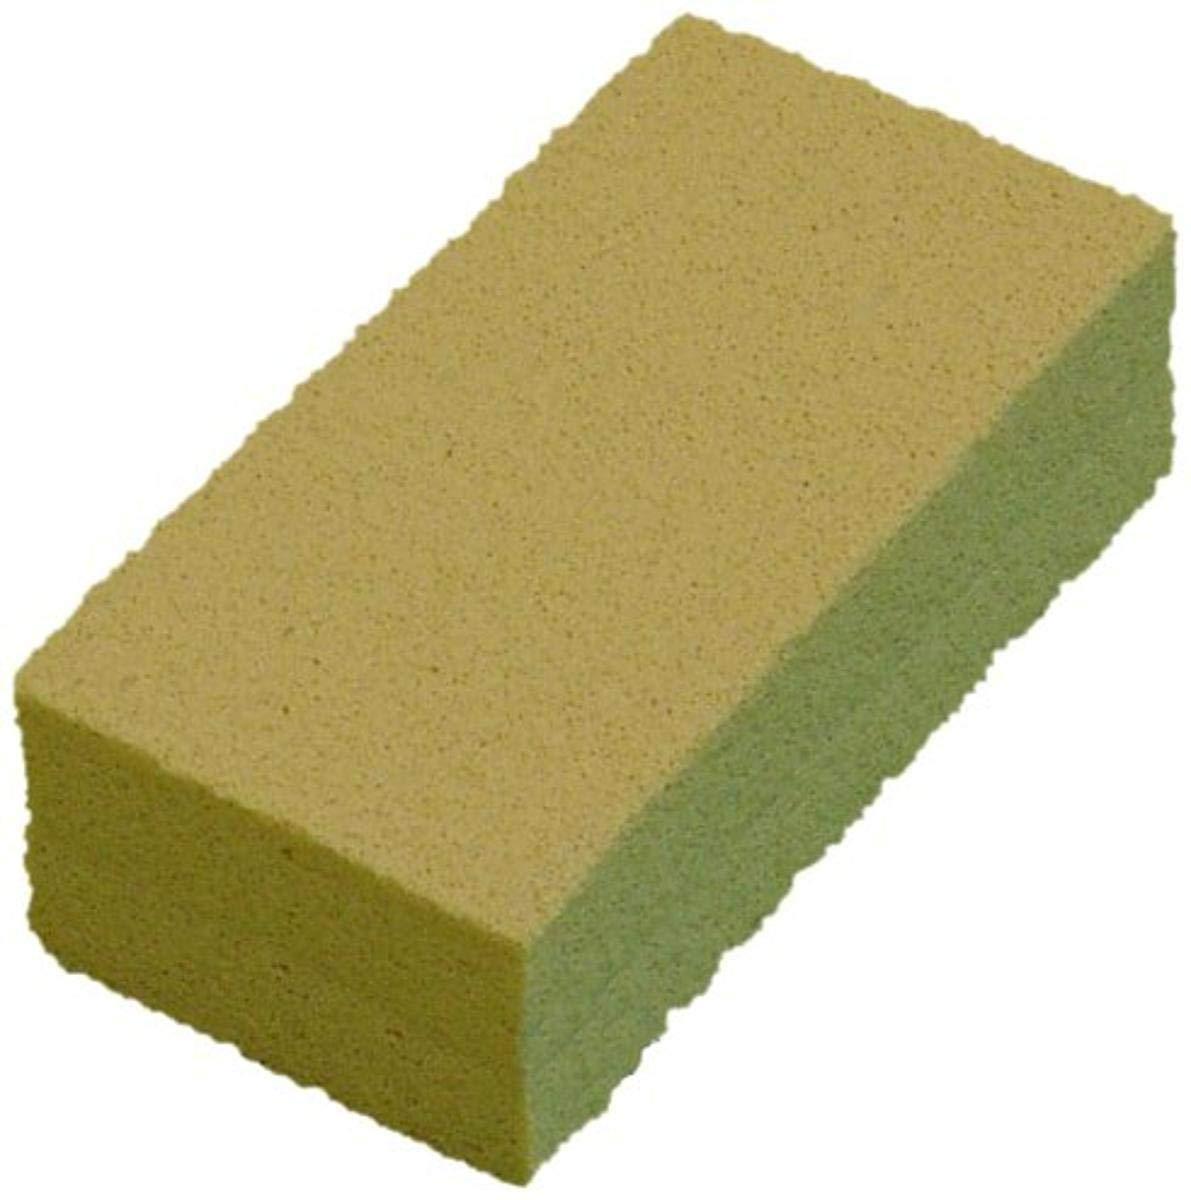 Zephyr 56136 Dover Dry Rubber Smoke Sponge, 6